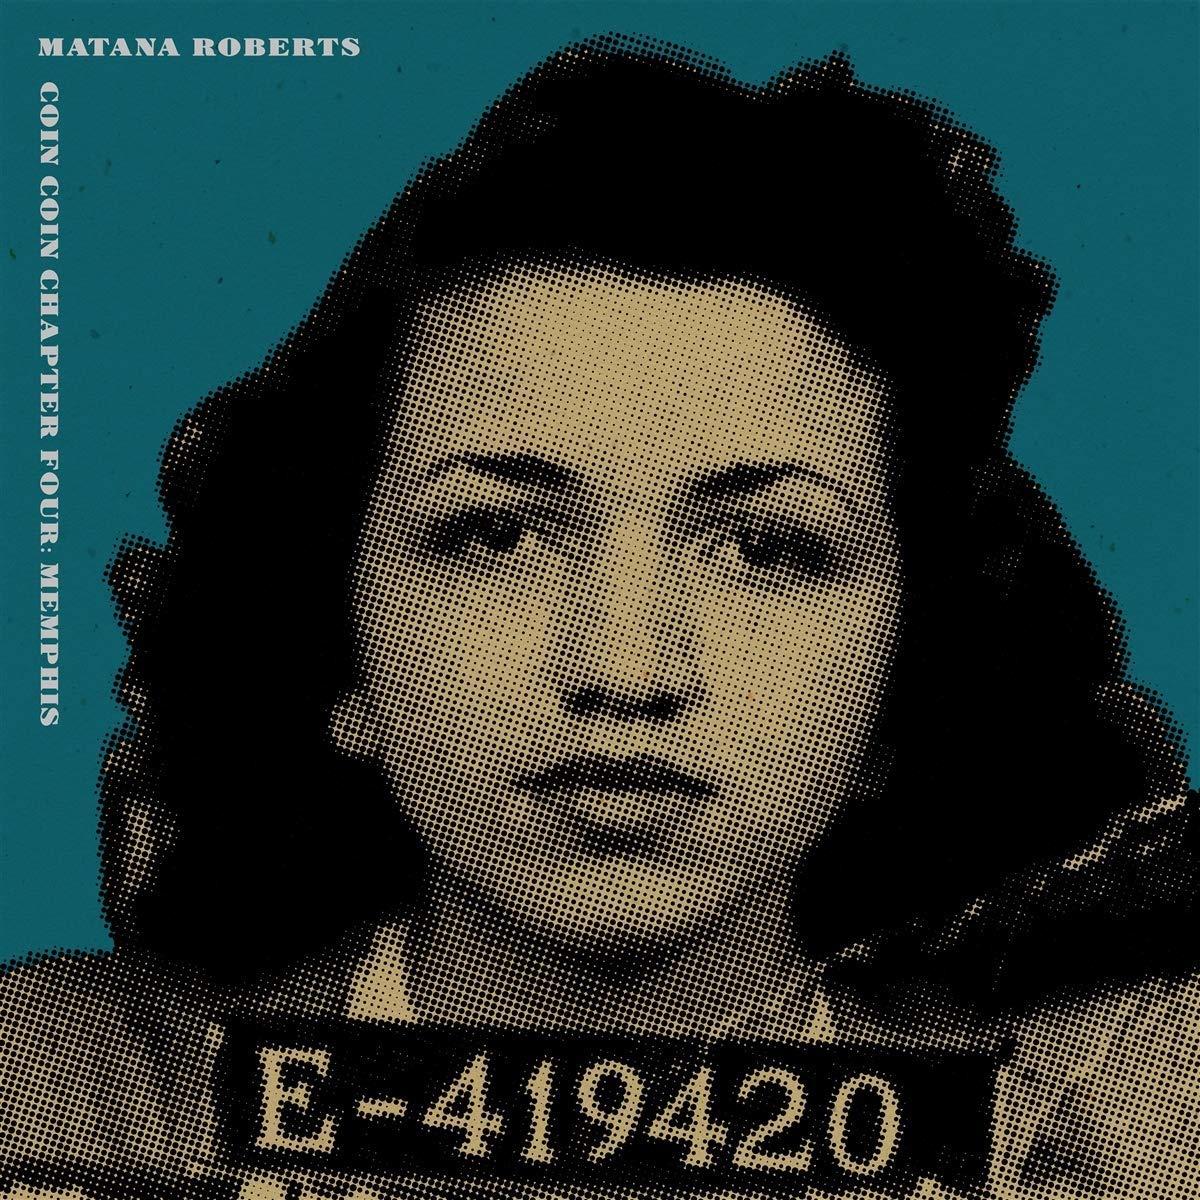 Buy Matana Roberts, COIN COIN Volume Four: Memphis New or Used via Amazon